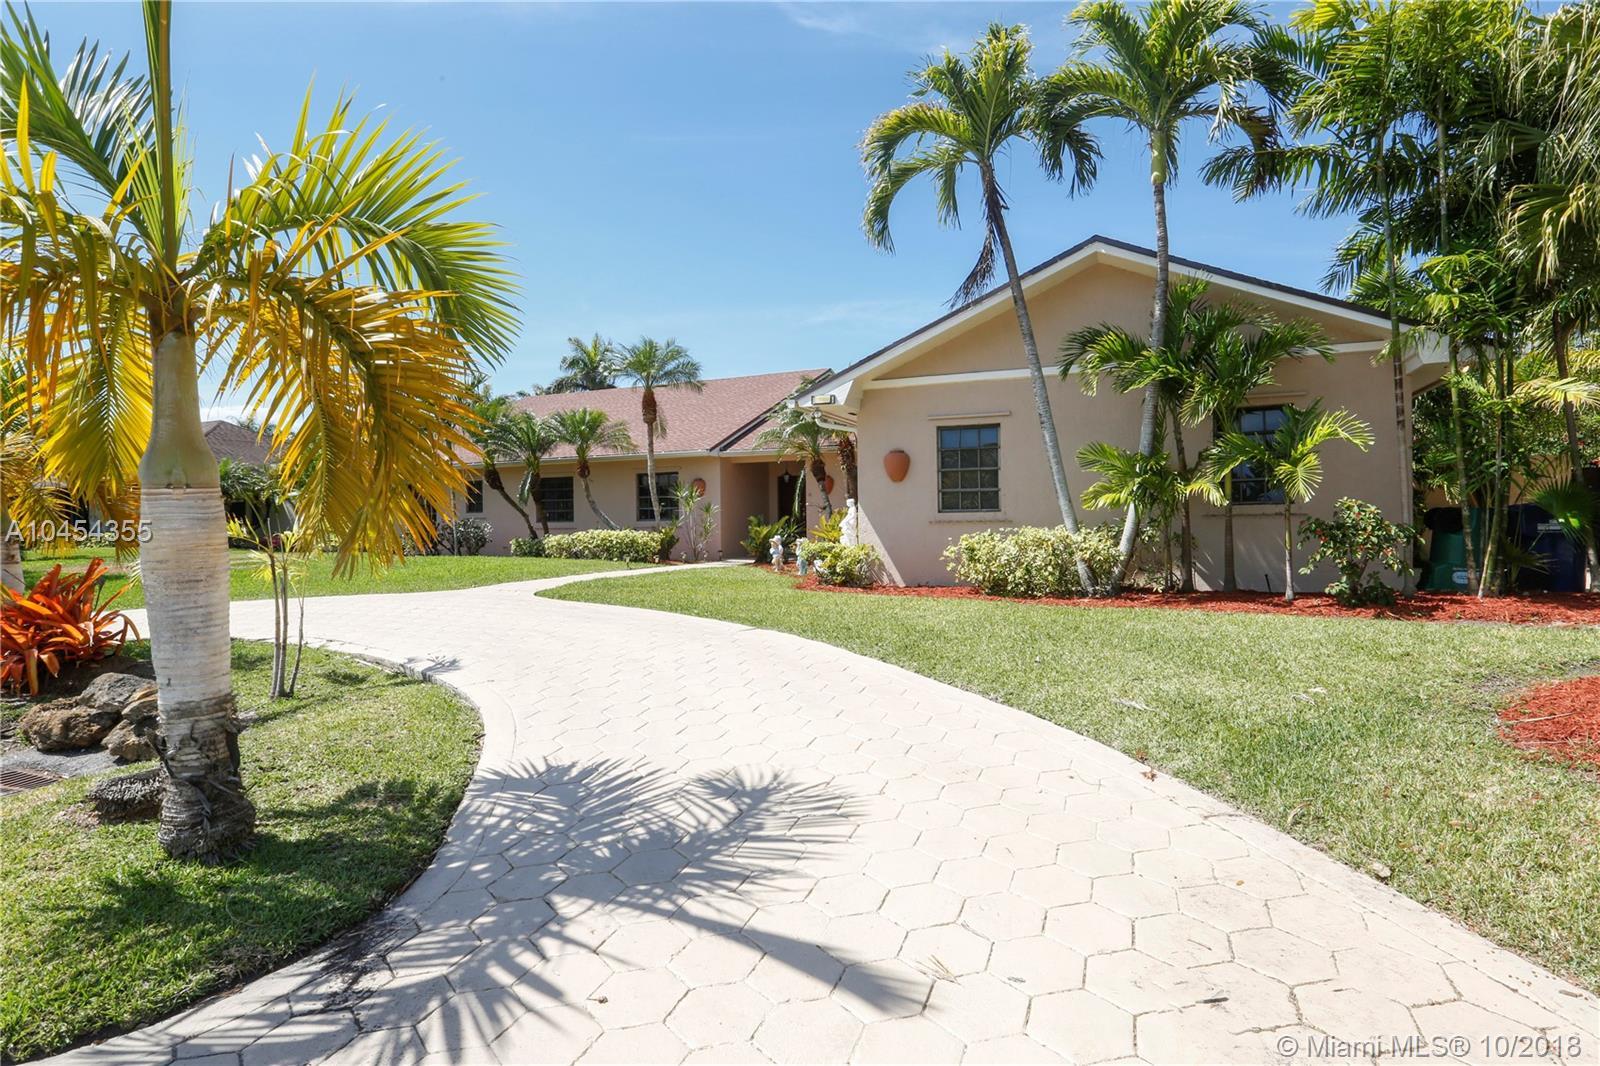 9981 Sw 143rd St, Miami FL, 33176